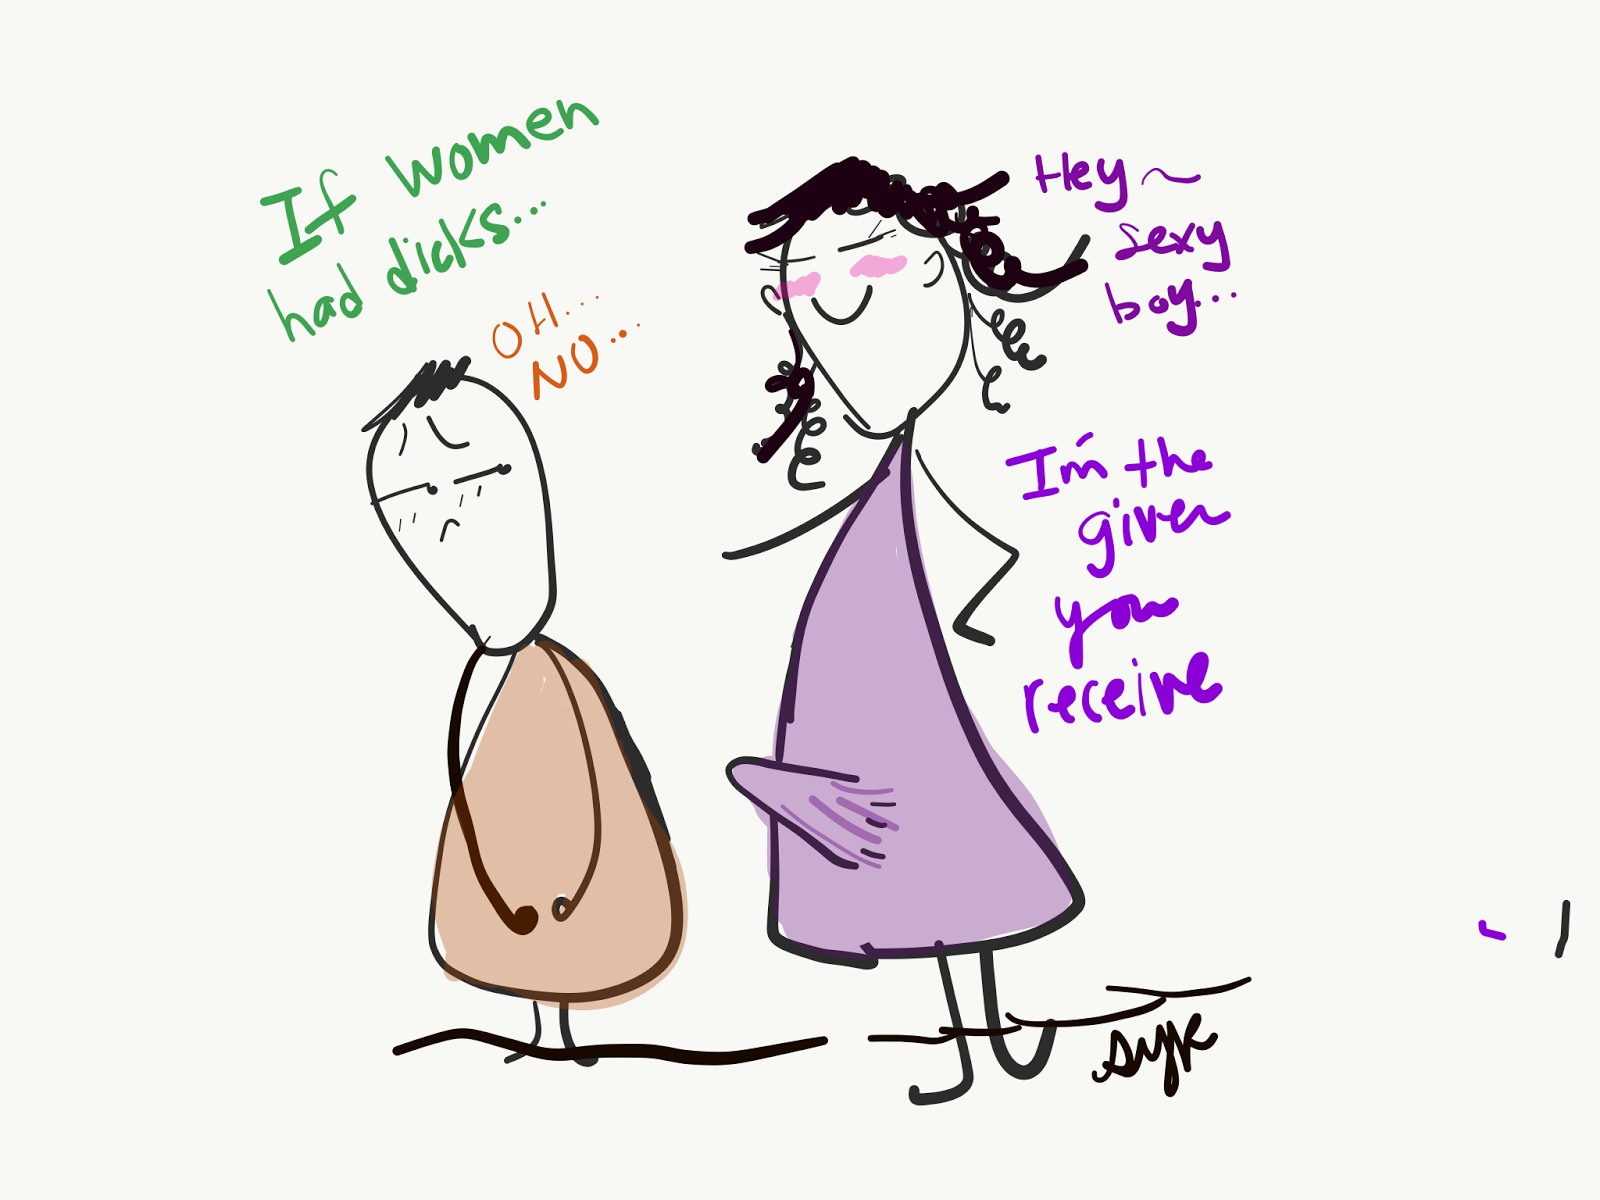 Women receiving dicks